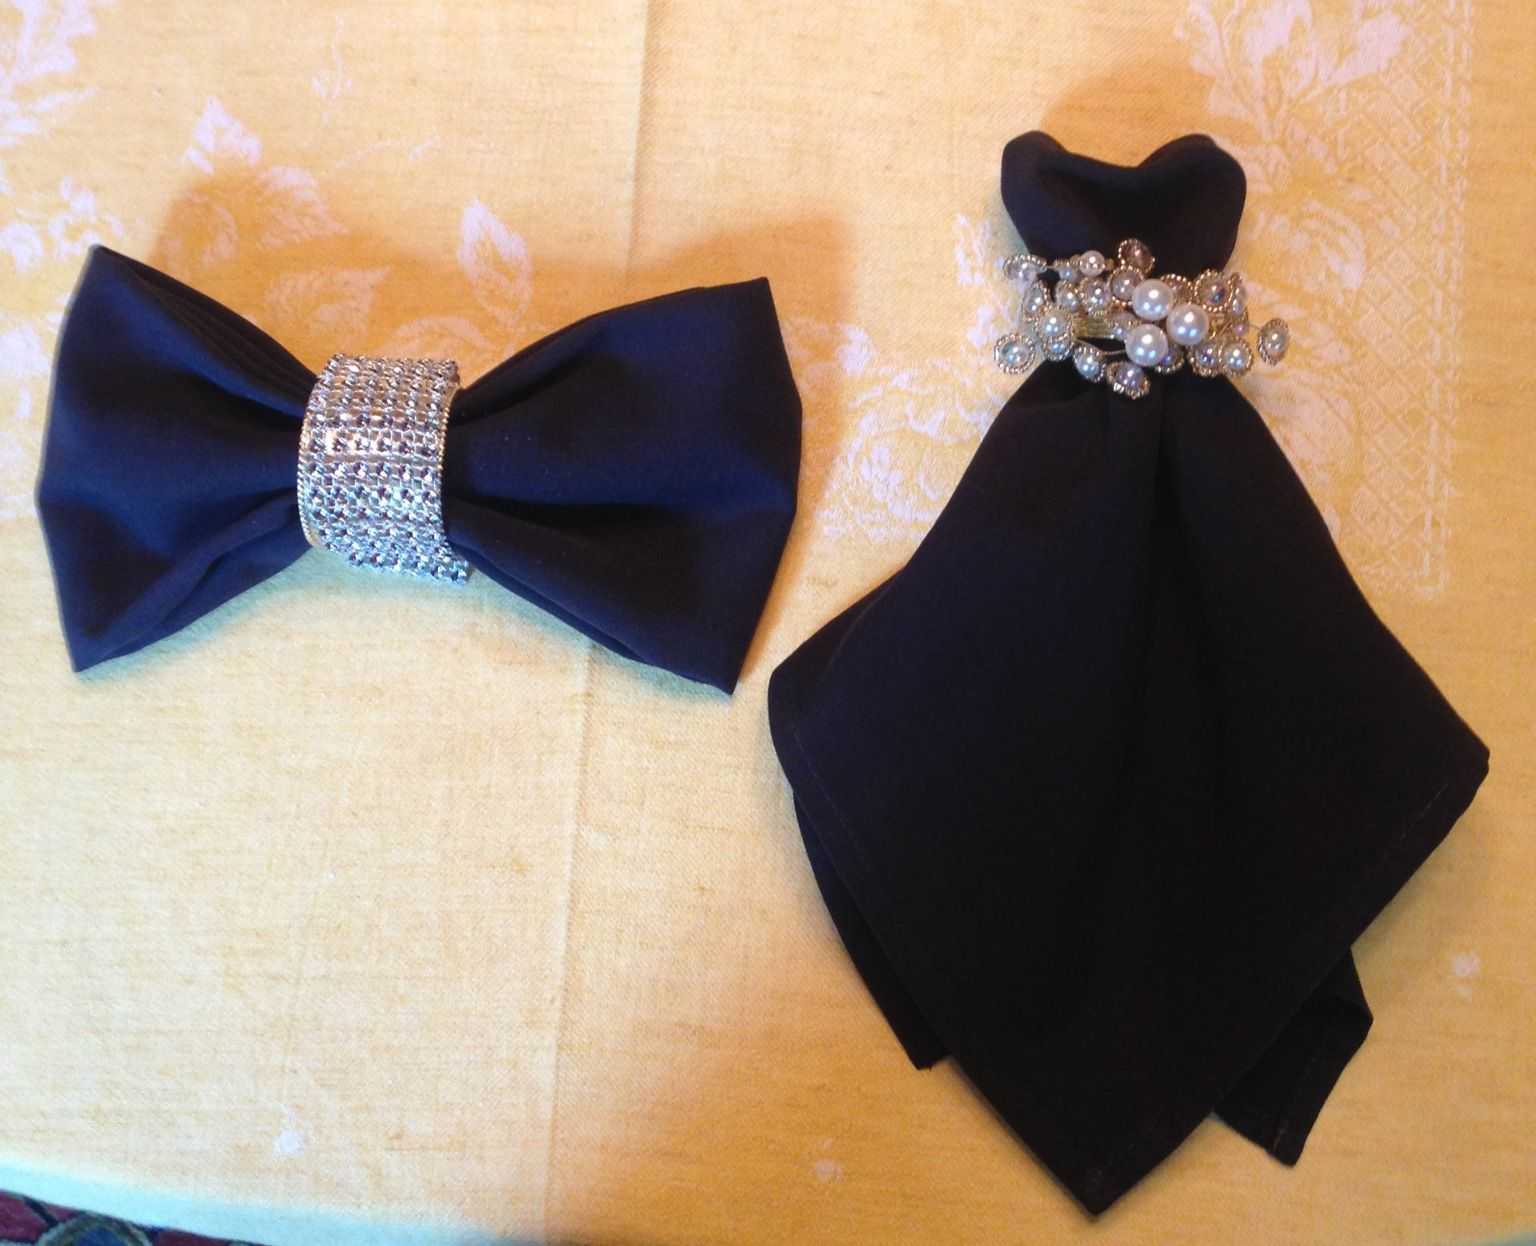 black napkins napkins for wedding Cocktail dress Bowtie napkin folding